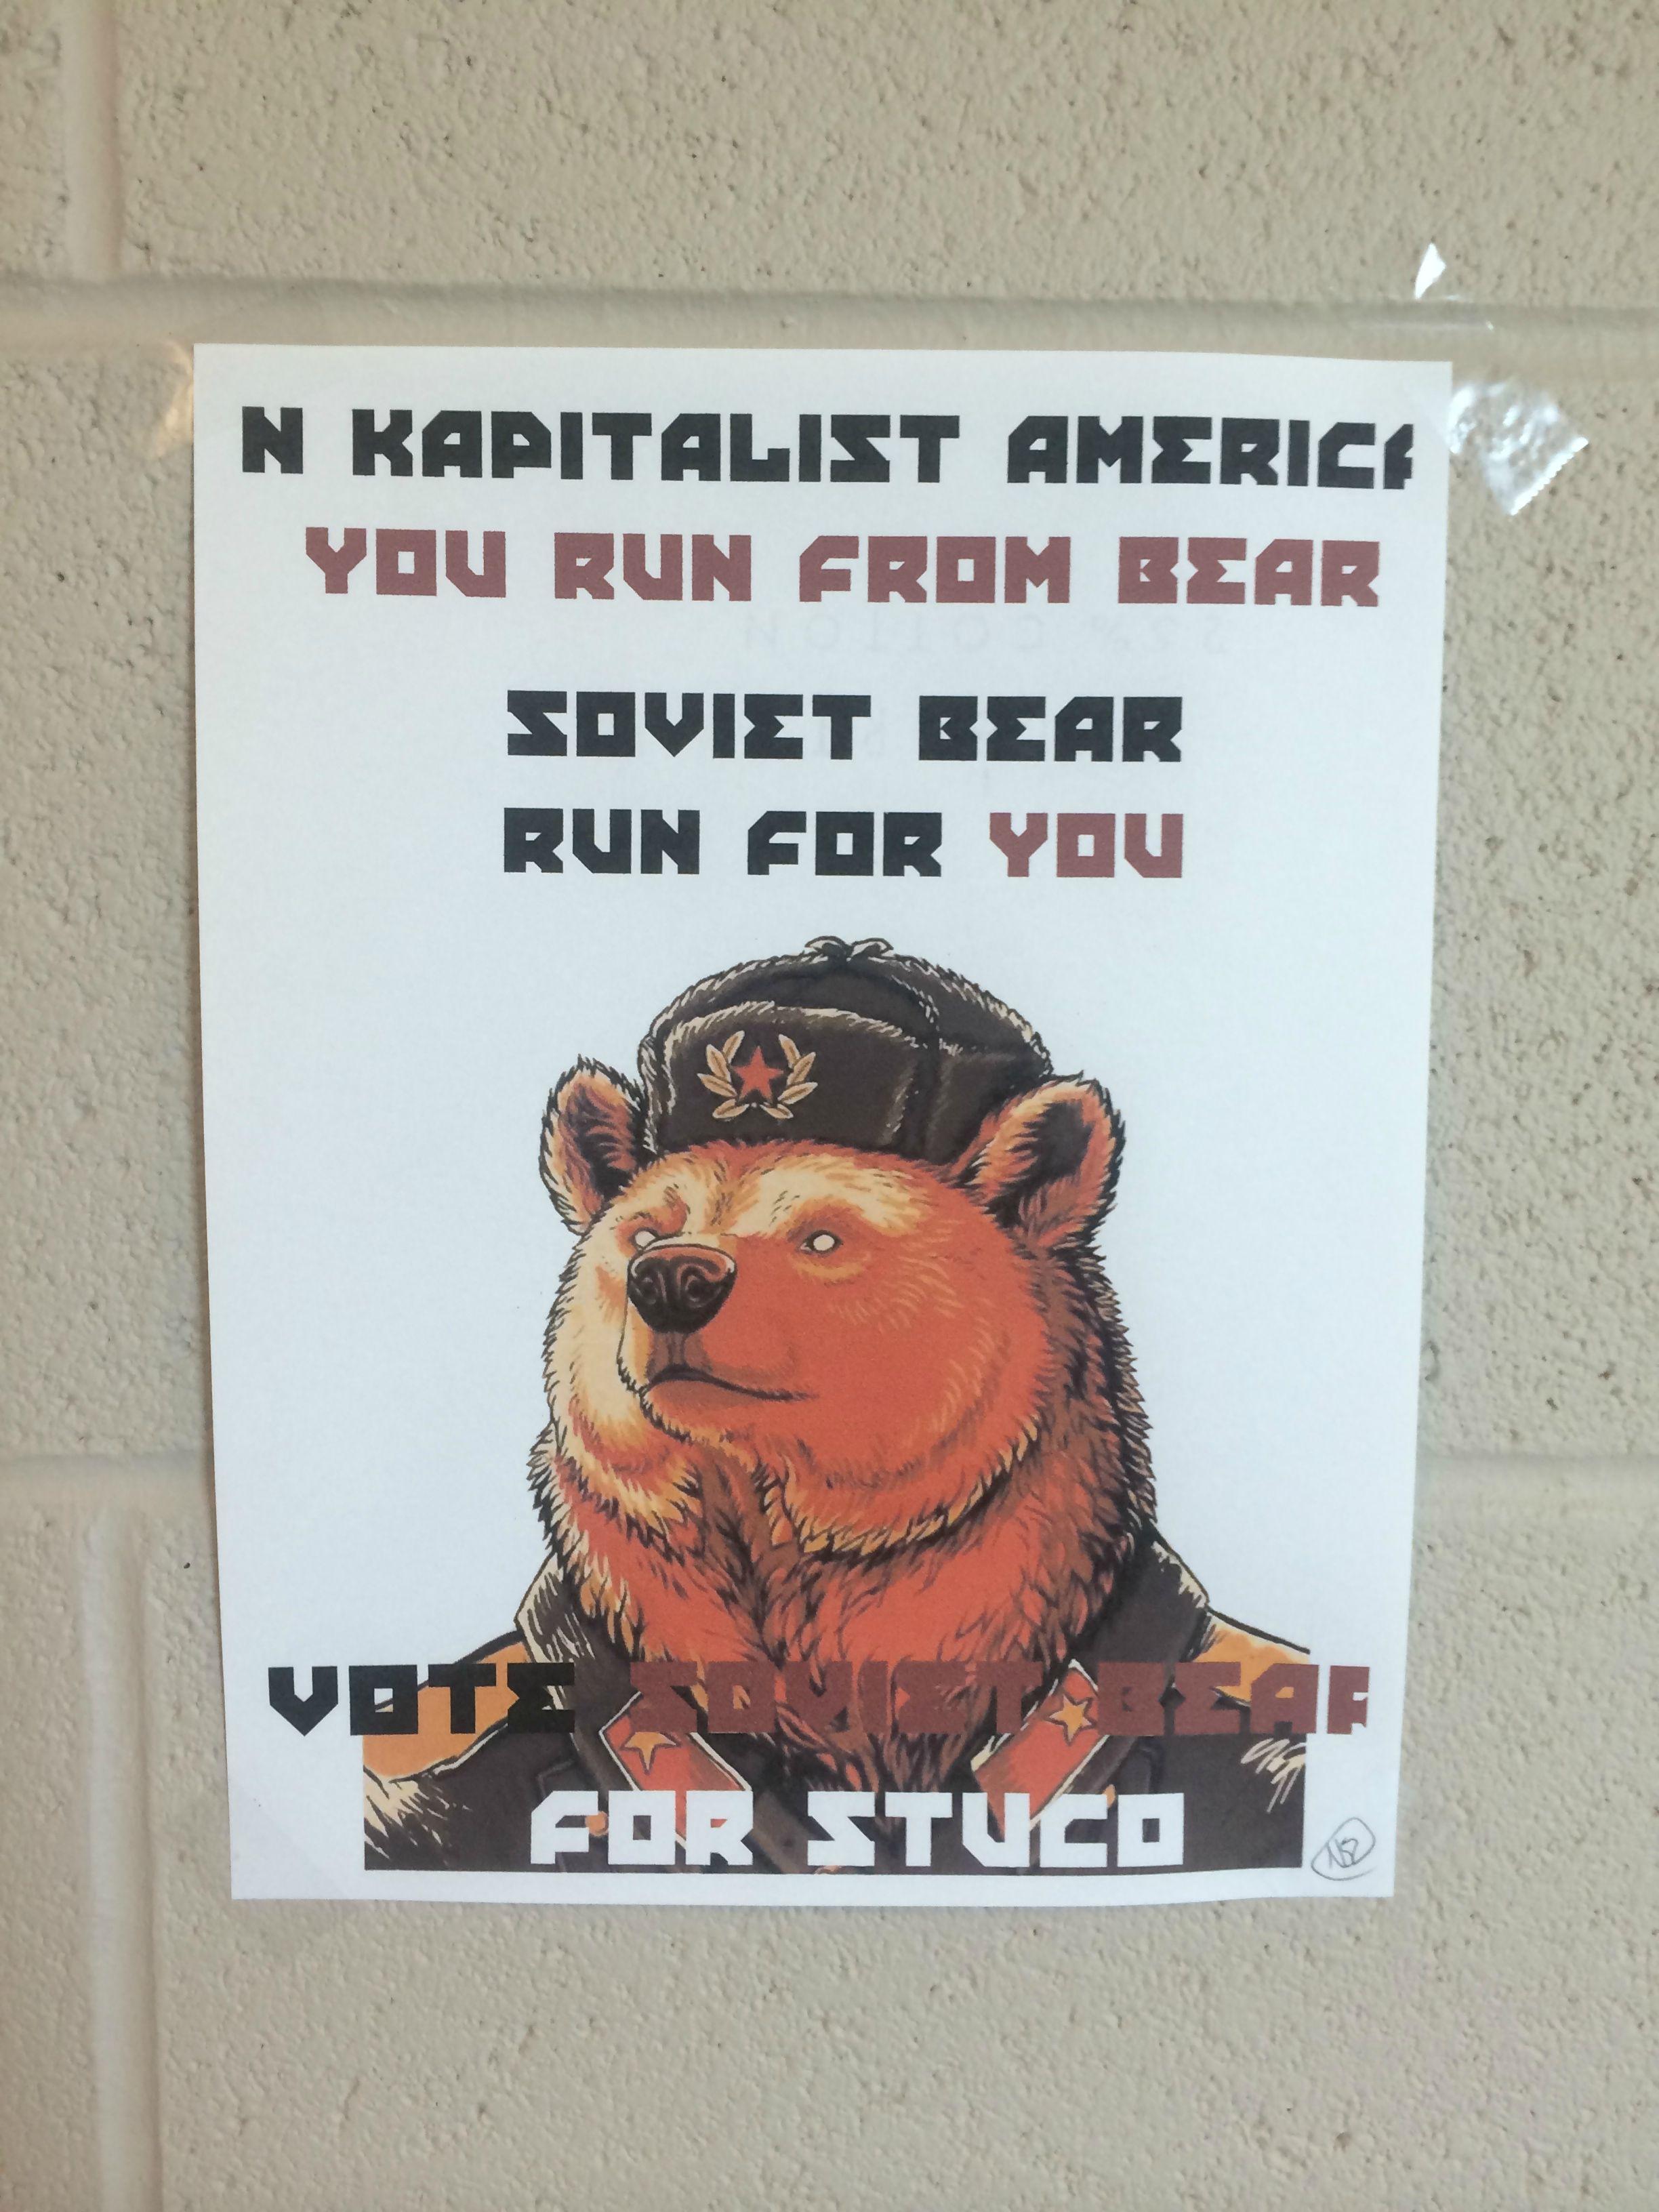 Student Council Candidate Runs as 'Soviet Bear,' Hilarity Ensues ...